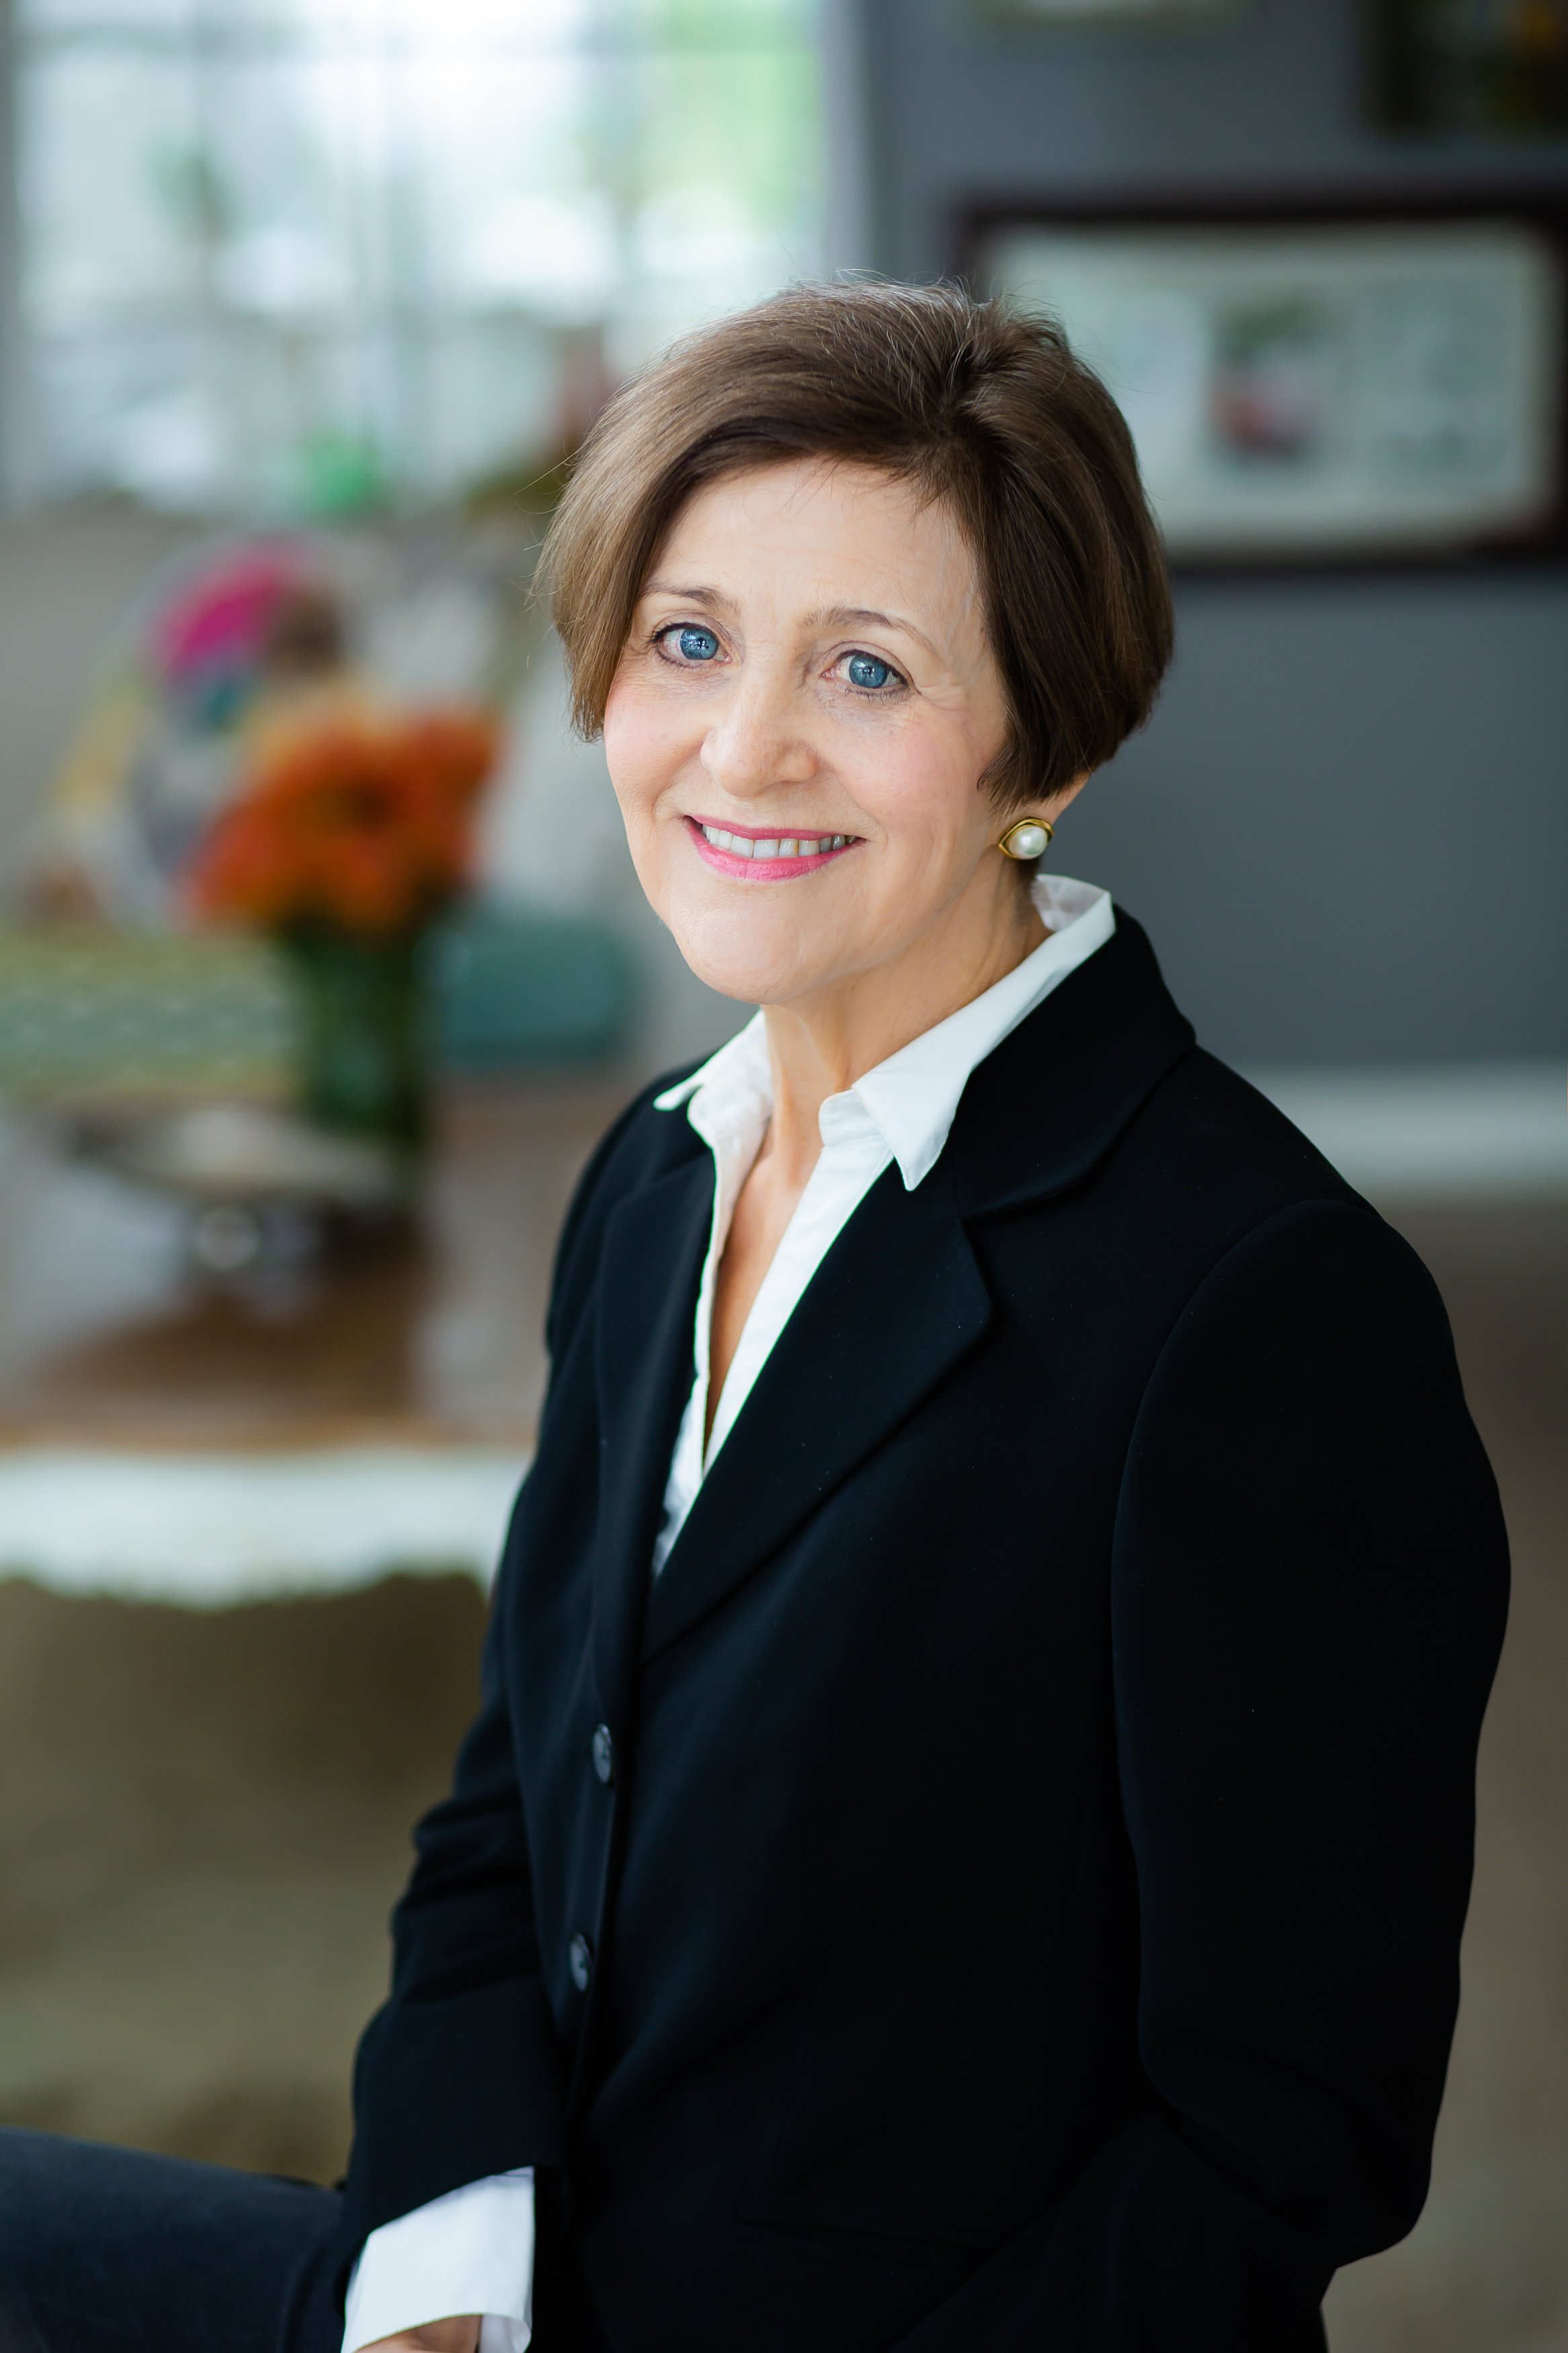 Helena Opperman